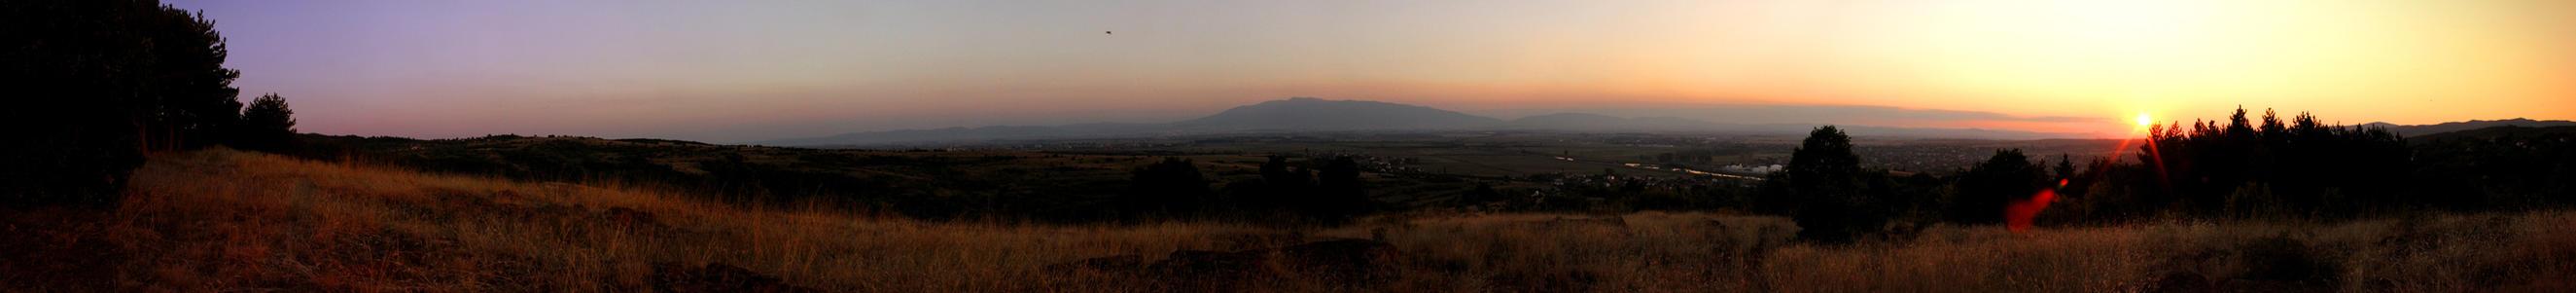 Sunset panorama by lapis-lazuri